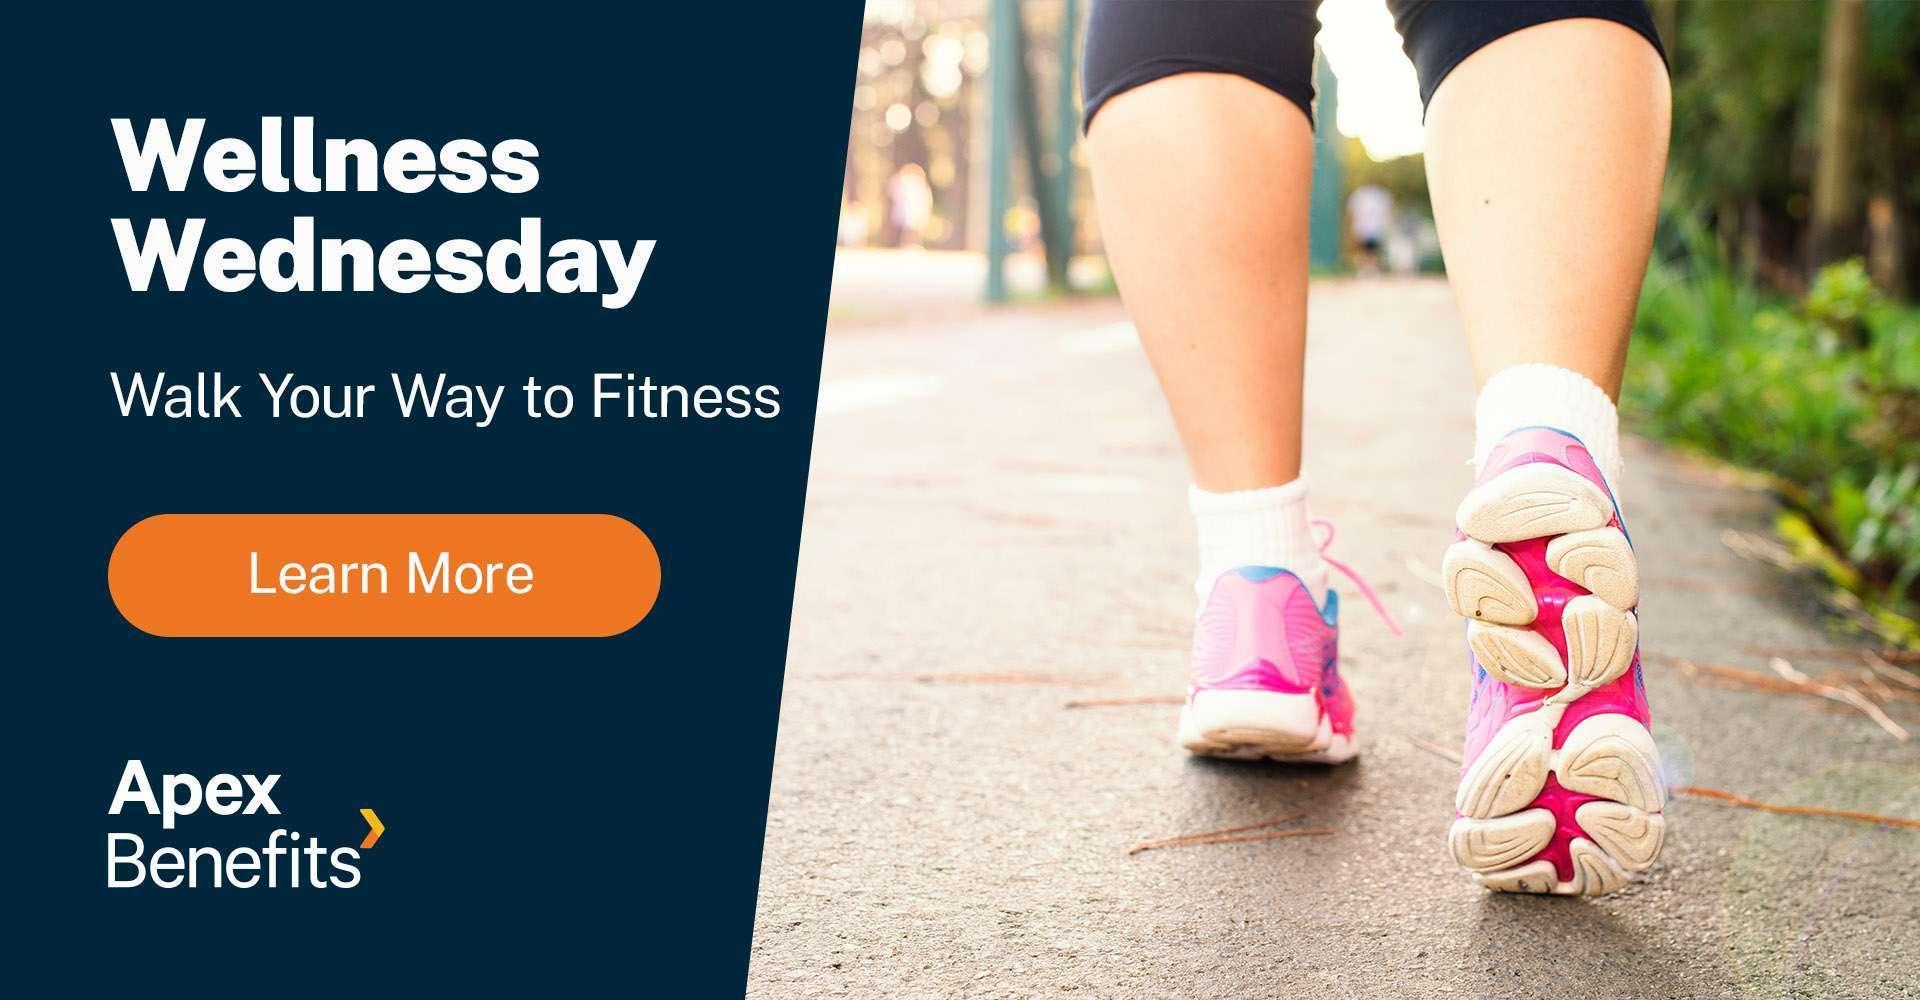 Wellness Wednesday: Walk Your Way to Fitness